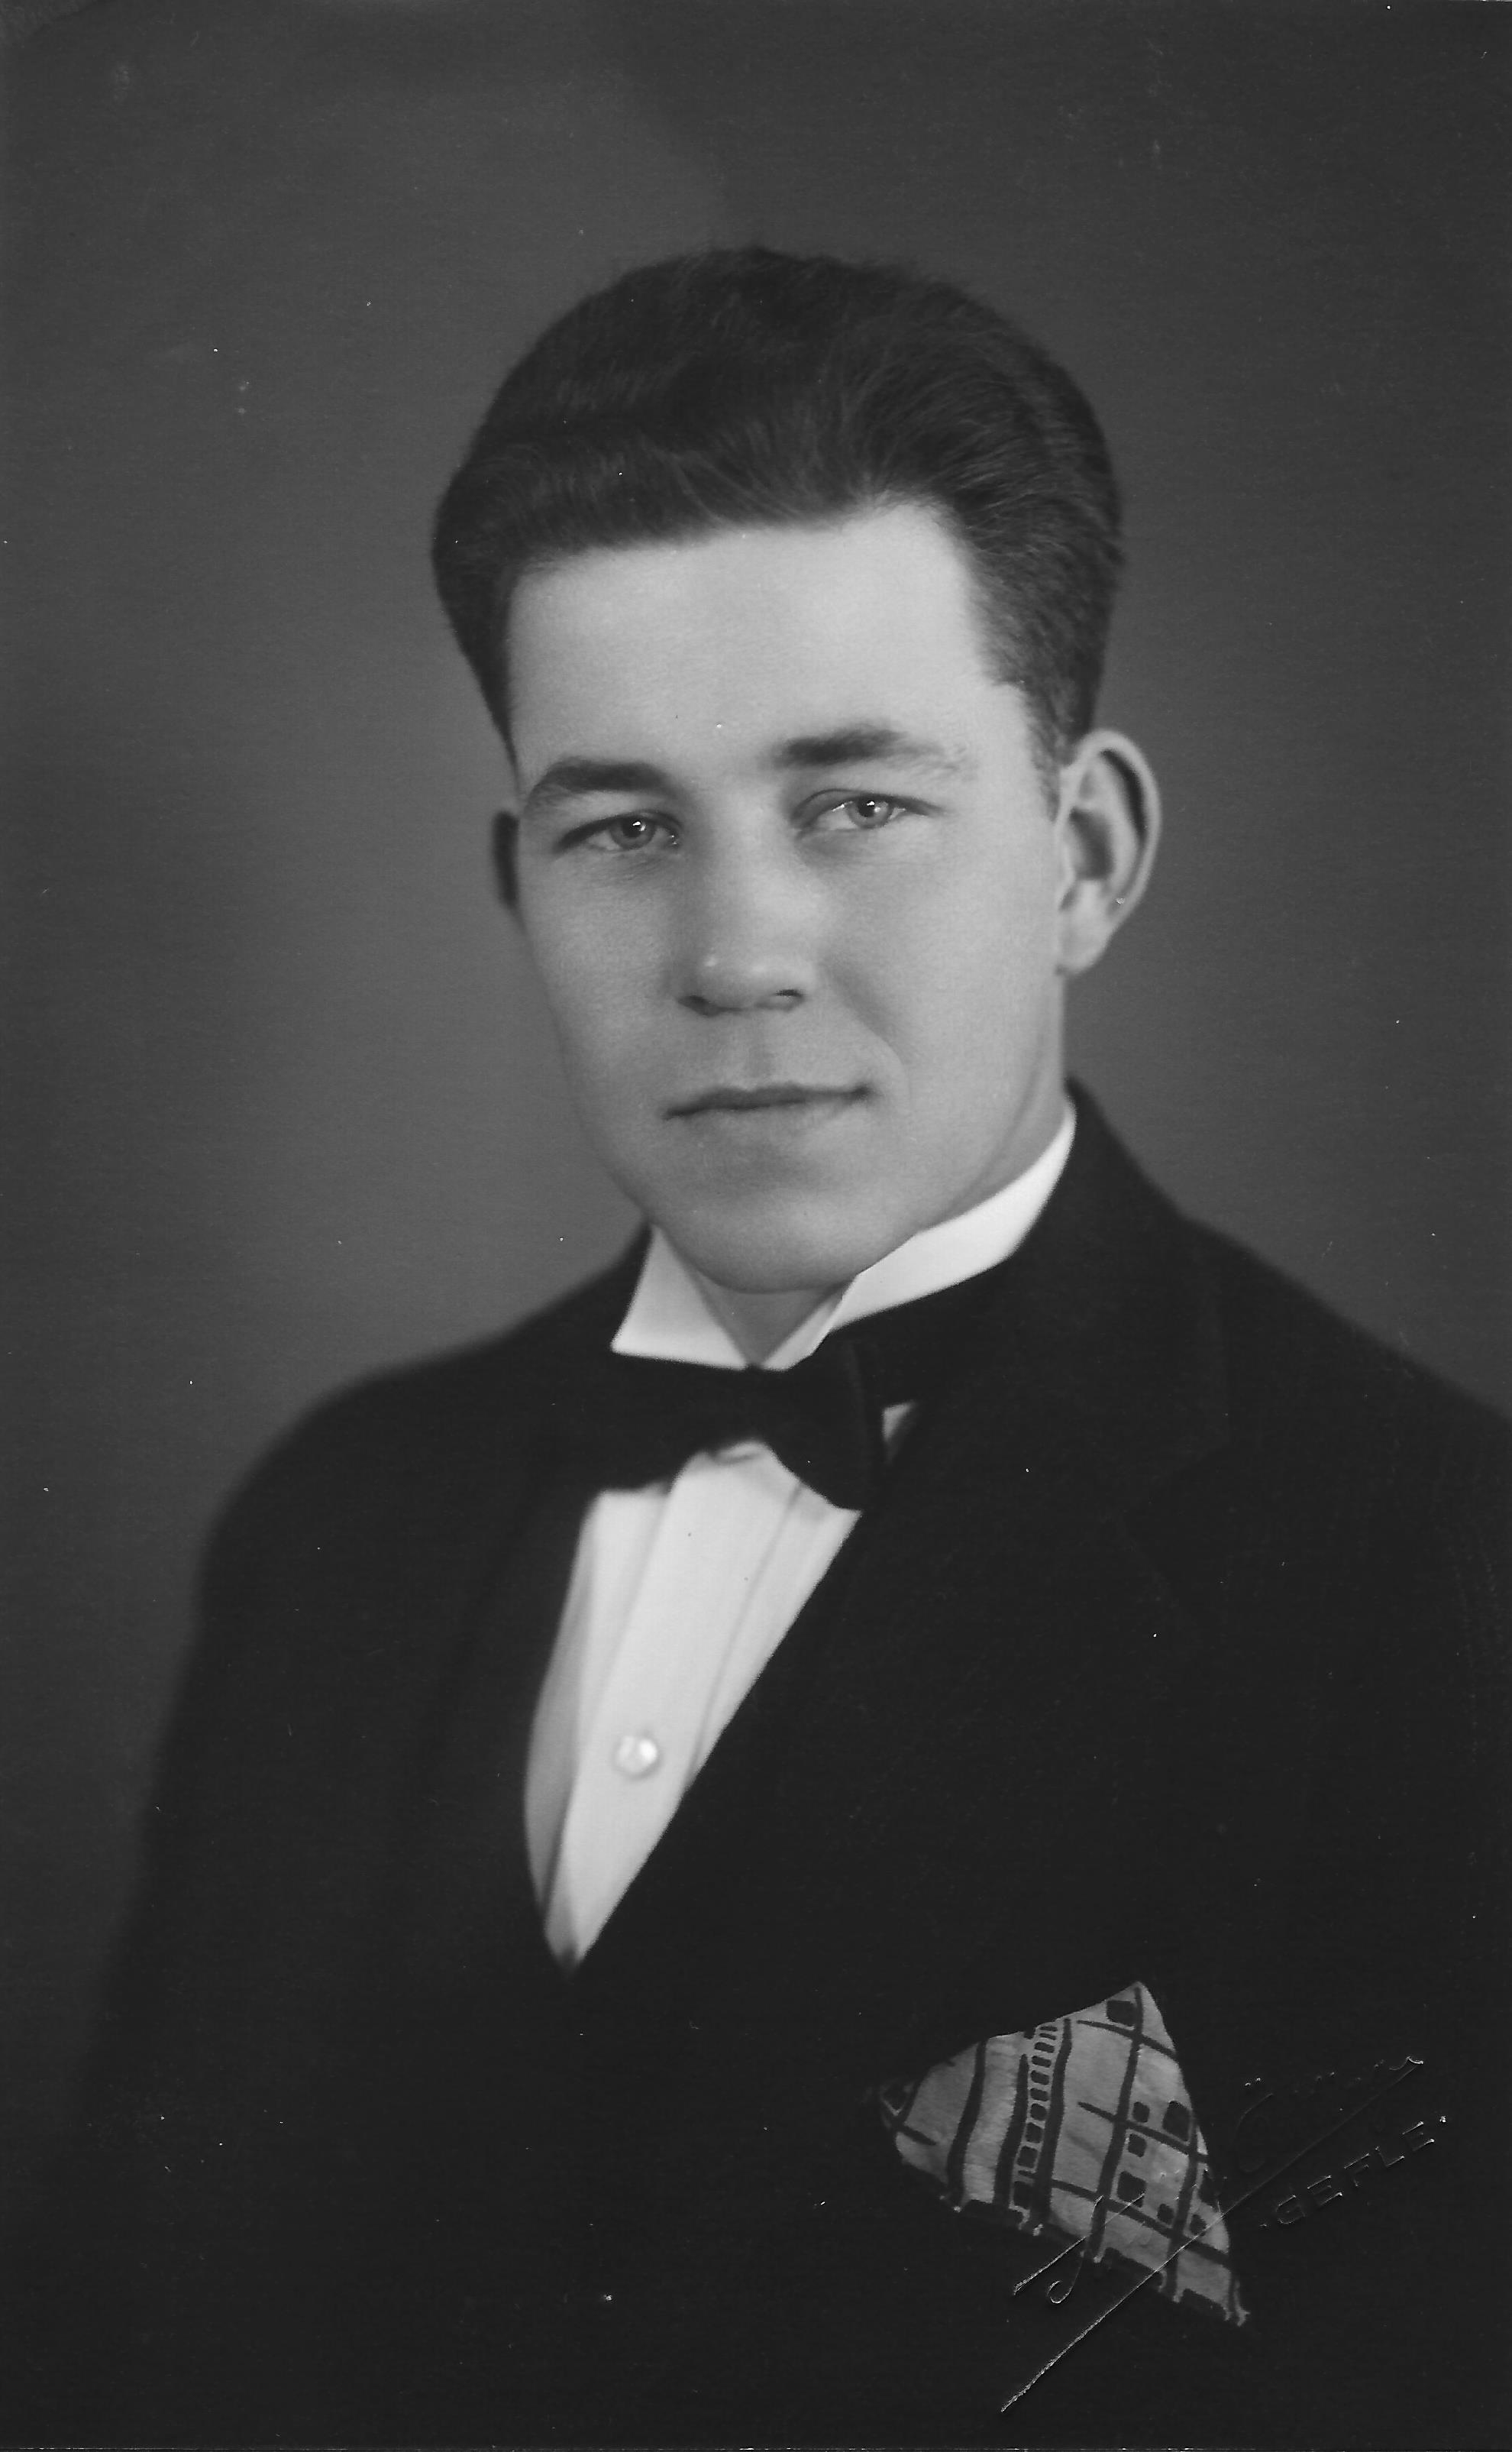 Bjorklund, Russell E